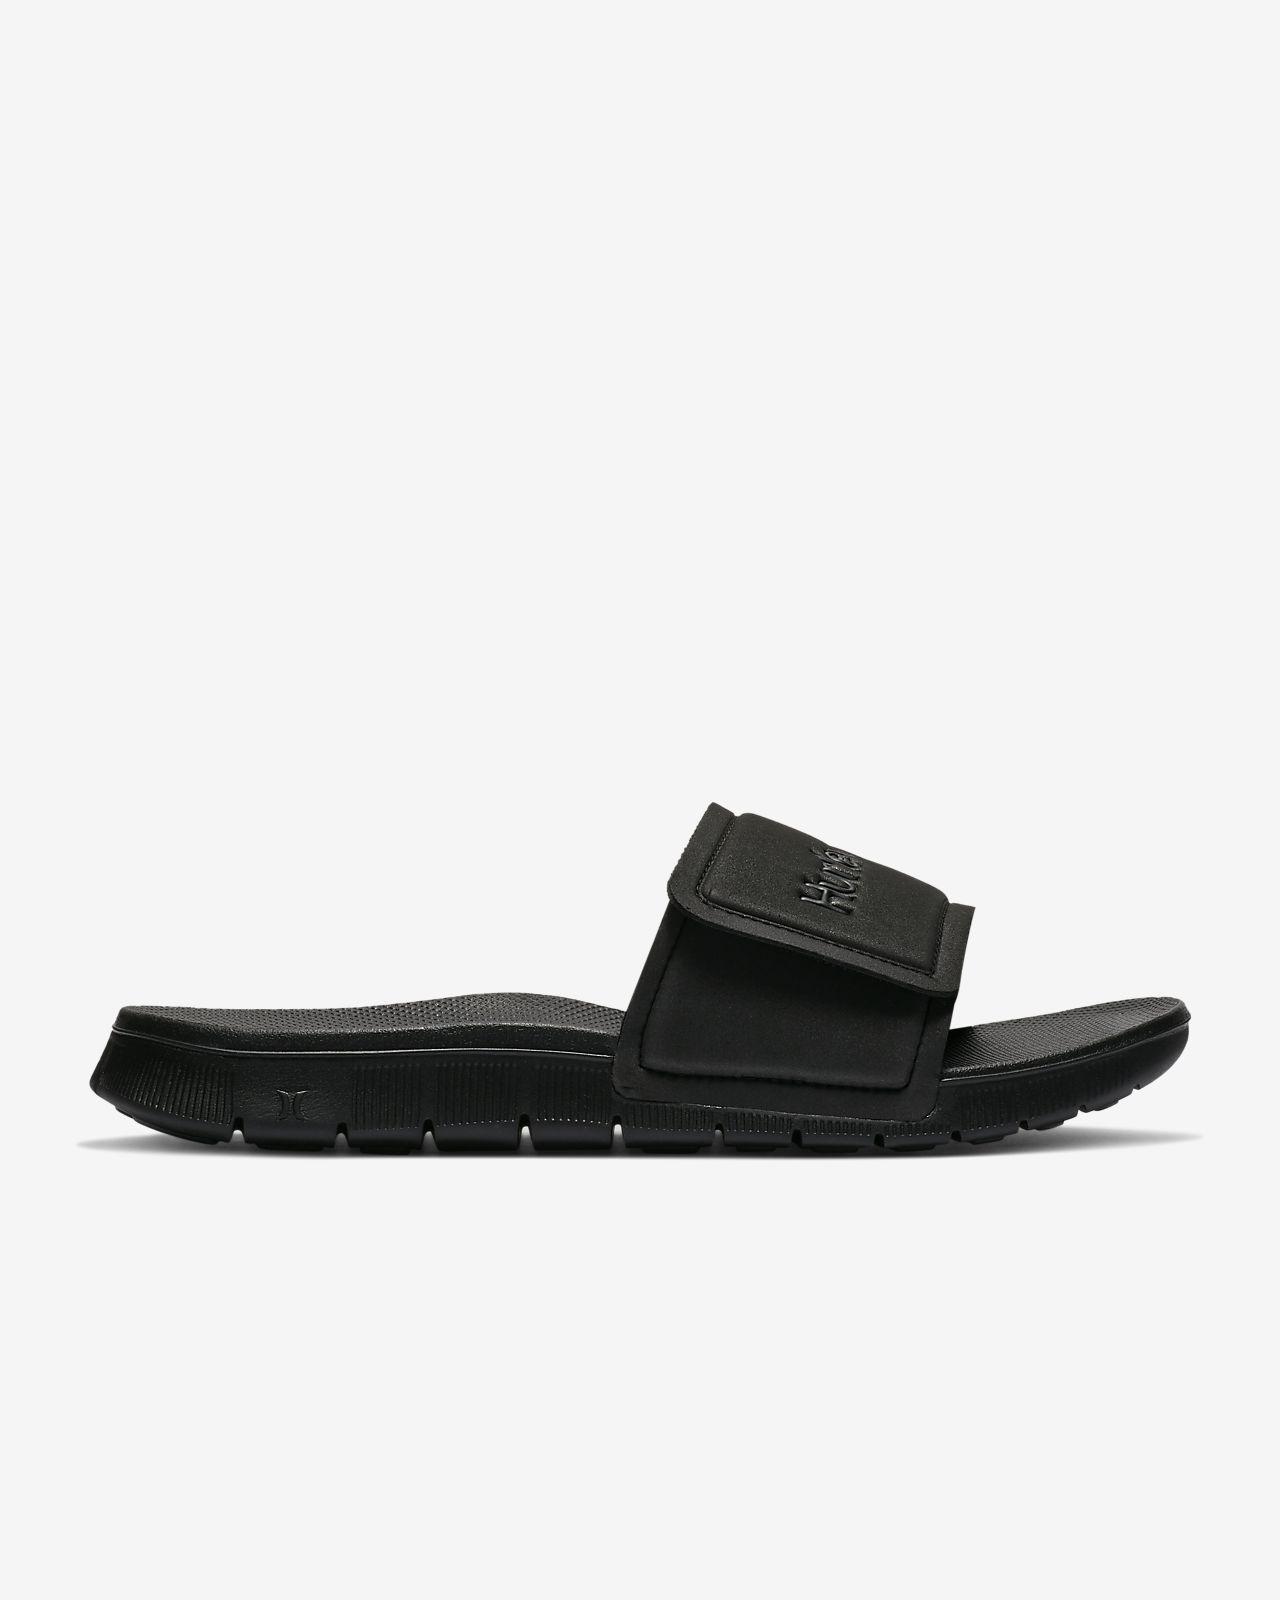 Nike Hurley Fusion Casual Schuhe Austria Sale, Nike Casual